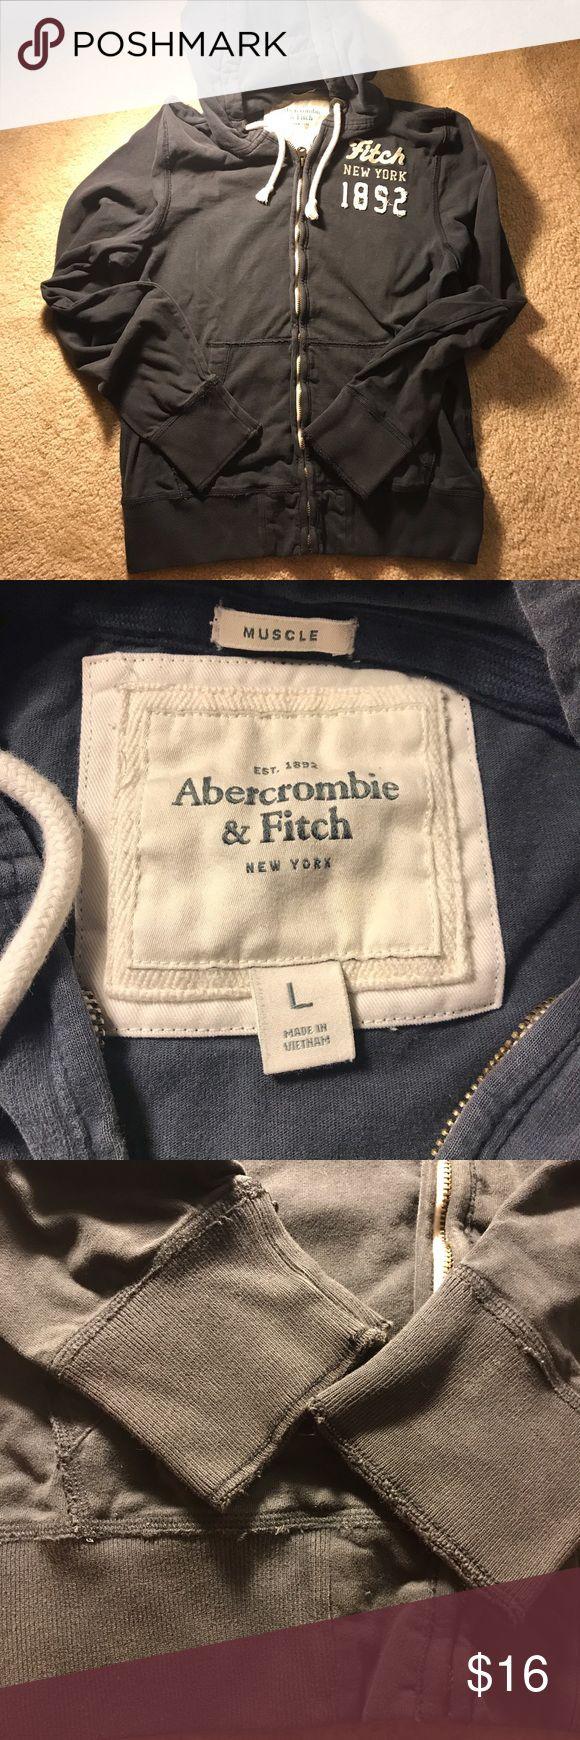 Abercrombie Men's Hoodie Navy blue color. Great hoodie! Abercrombie & Fitch Shirts Sweatshirts & Hoodies